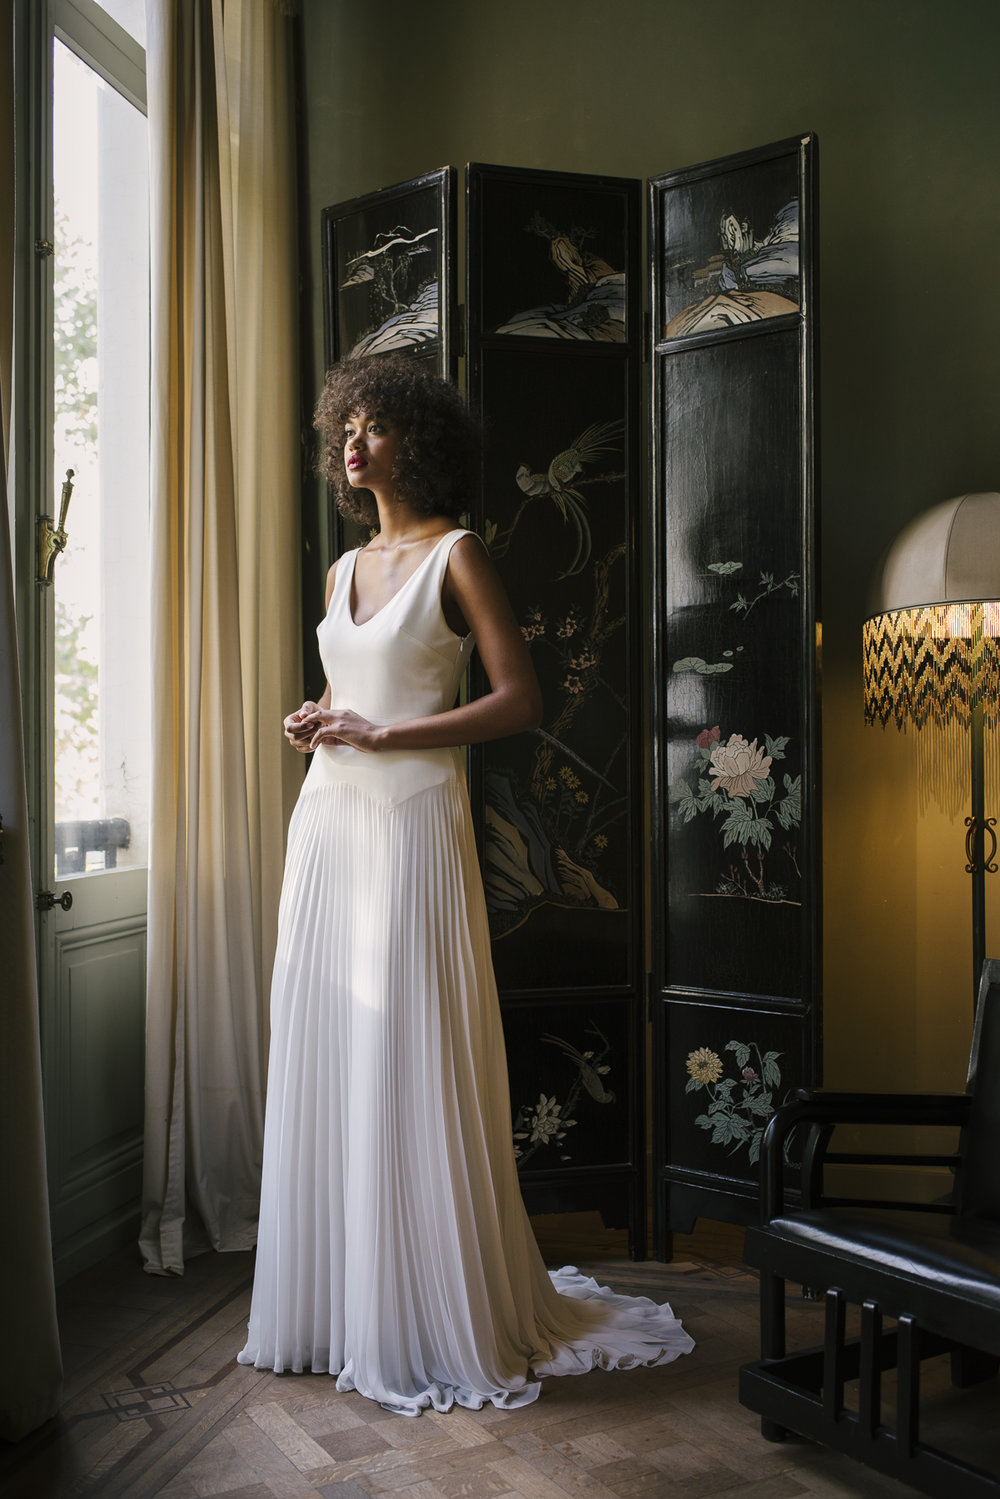 valentine-avoh-robe-mariee-grace-wedding-dress-bruxelles-photo-elodie-timmermans-1.jpg